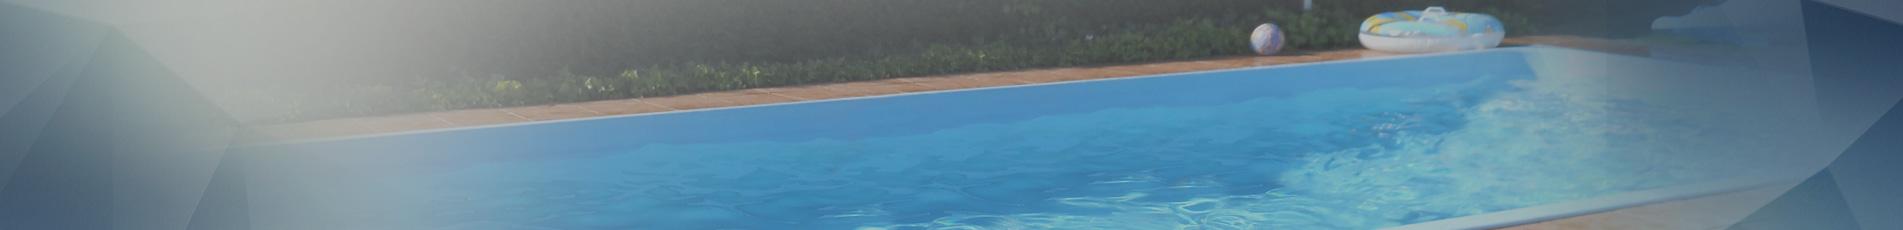 Fiberglas fabricaci n de piscinas en a coru a galicia - Fabricacion de piscinas ...